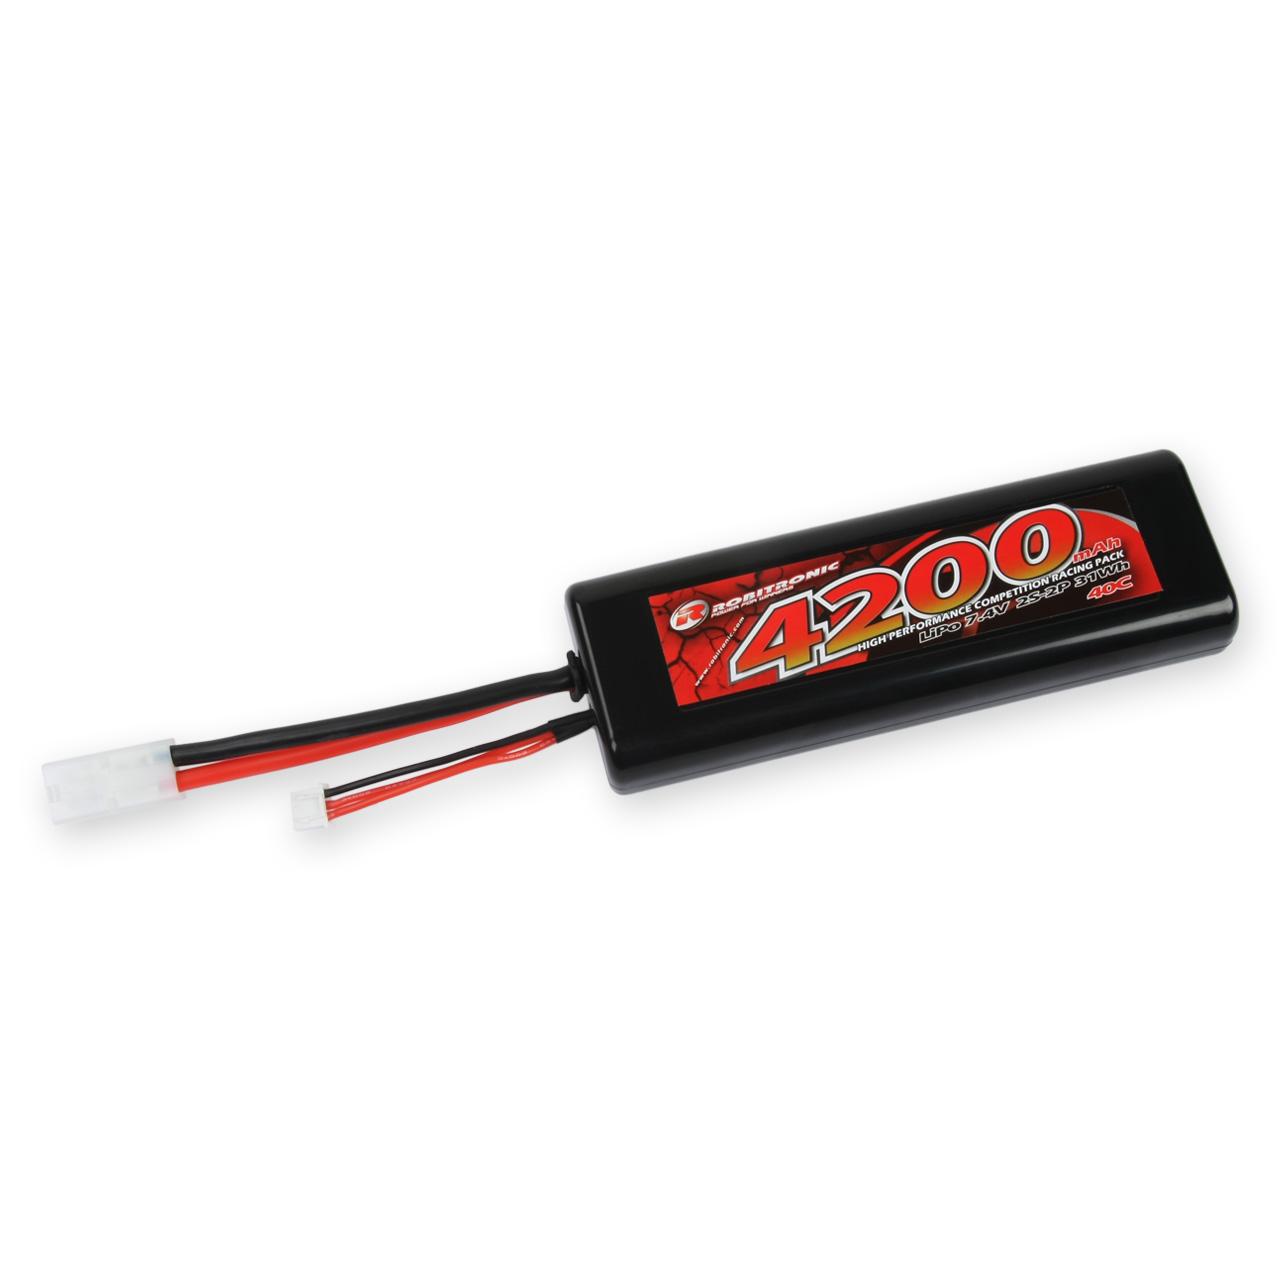 Robitronic LiPo Battery 4200mAh 2S 40C Tamiya Stick Pack, R05231